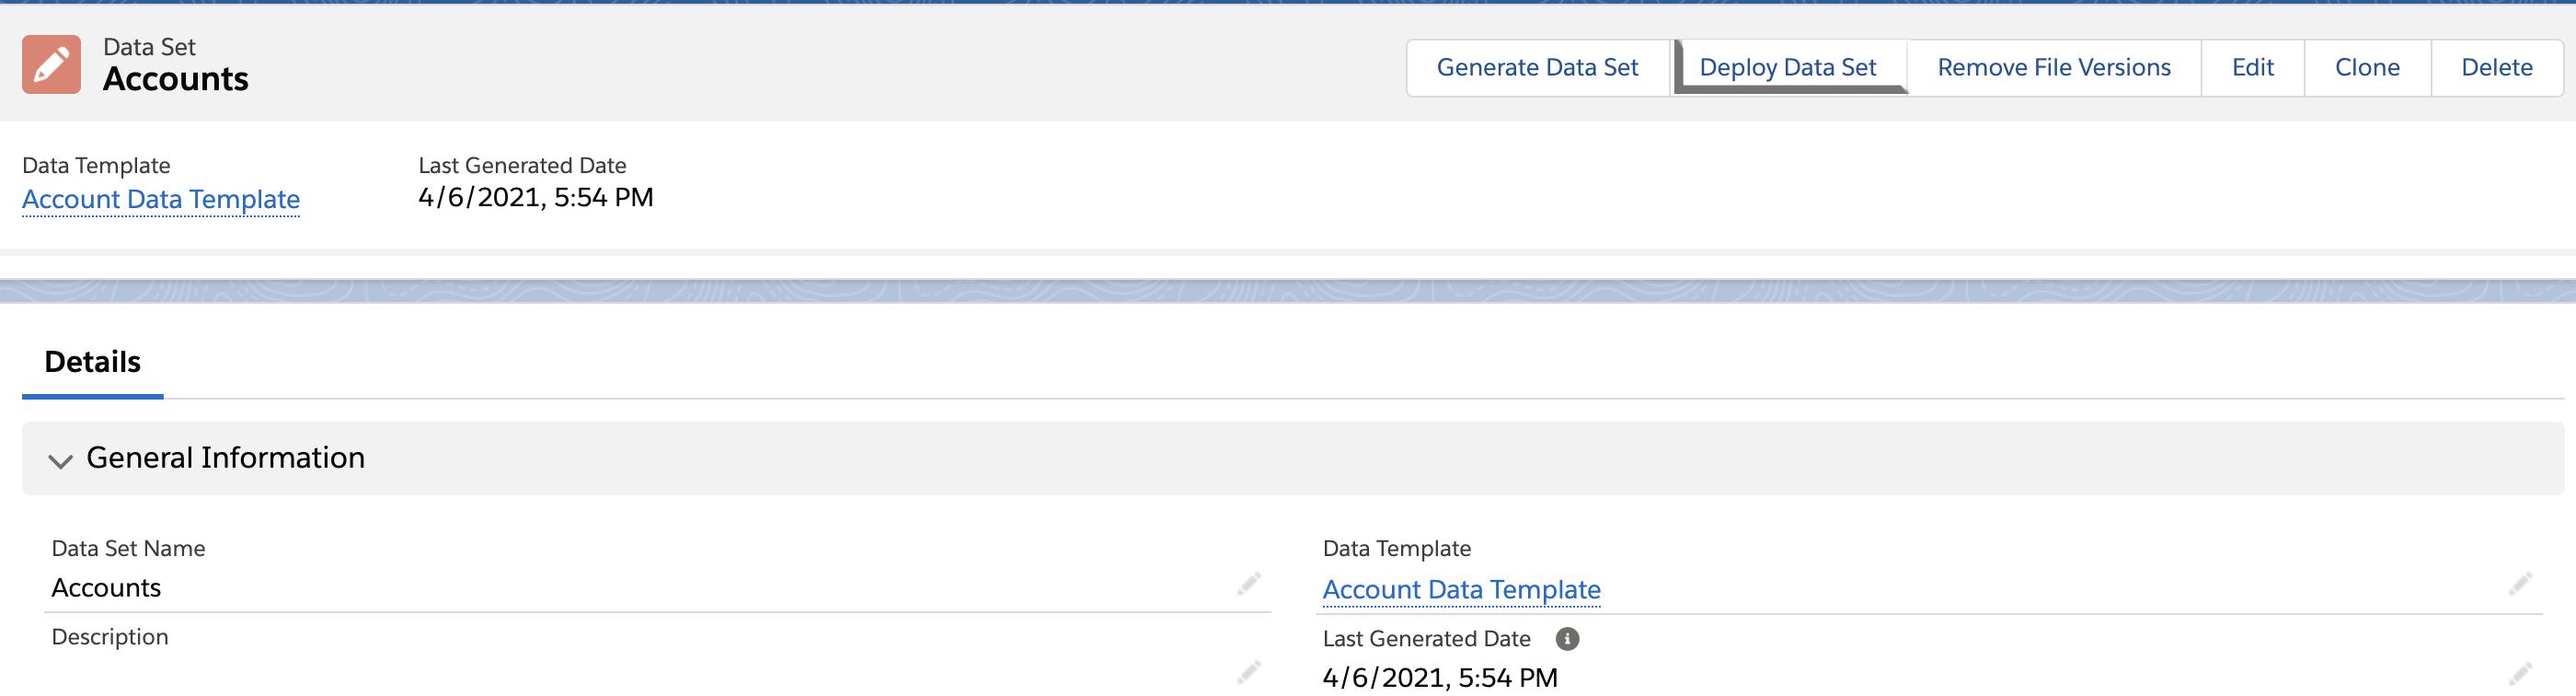 Deploy Data Set Button